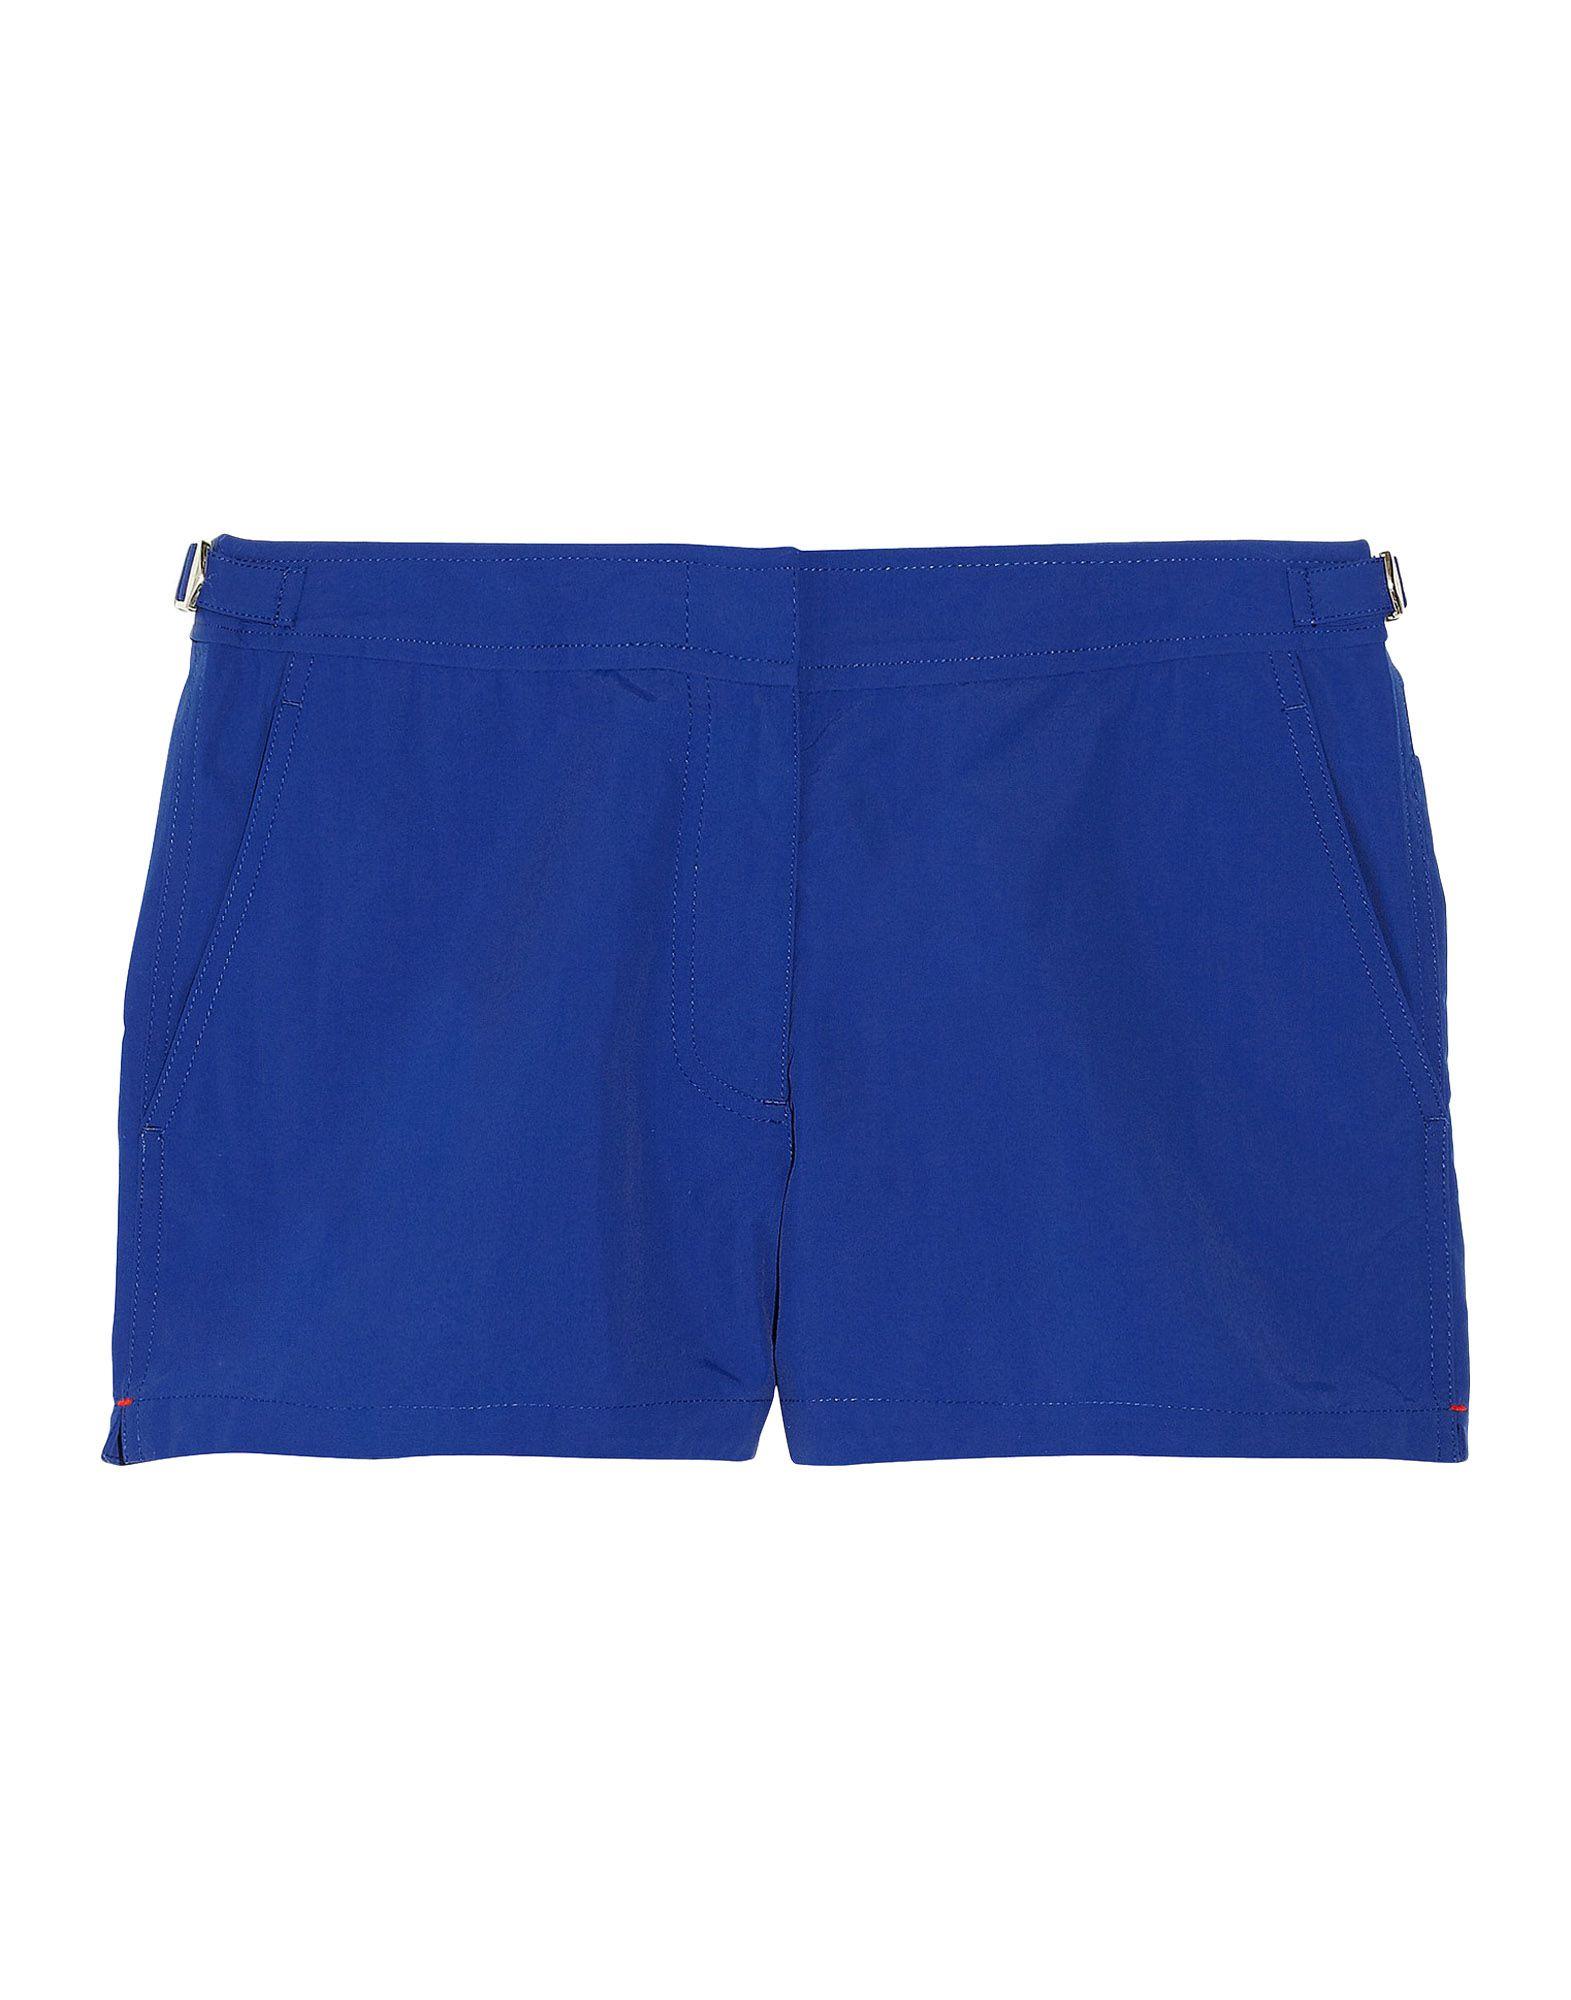 ORLEBAR BROWN Повседневные шорты orlebar brown пляжные брюки и шорты